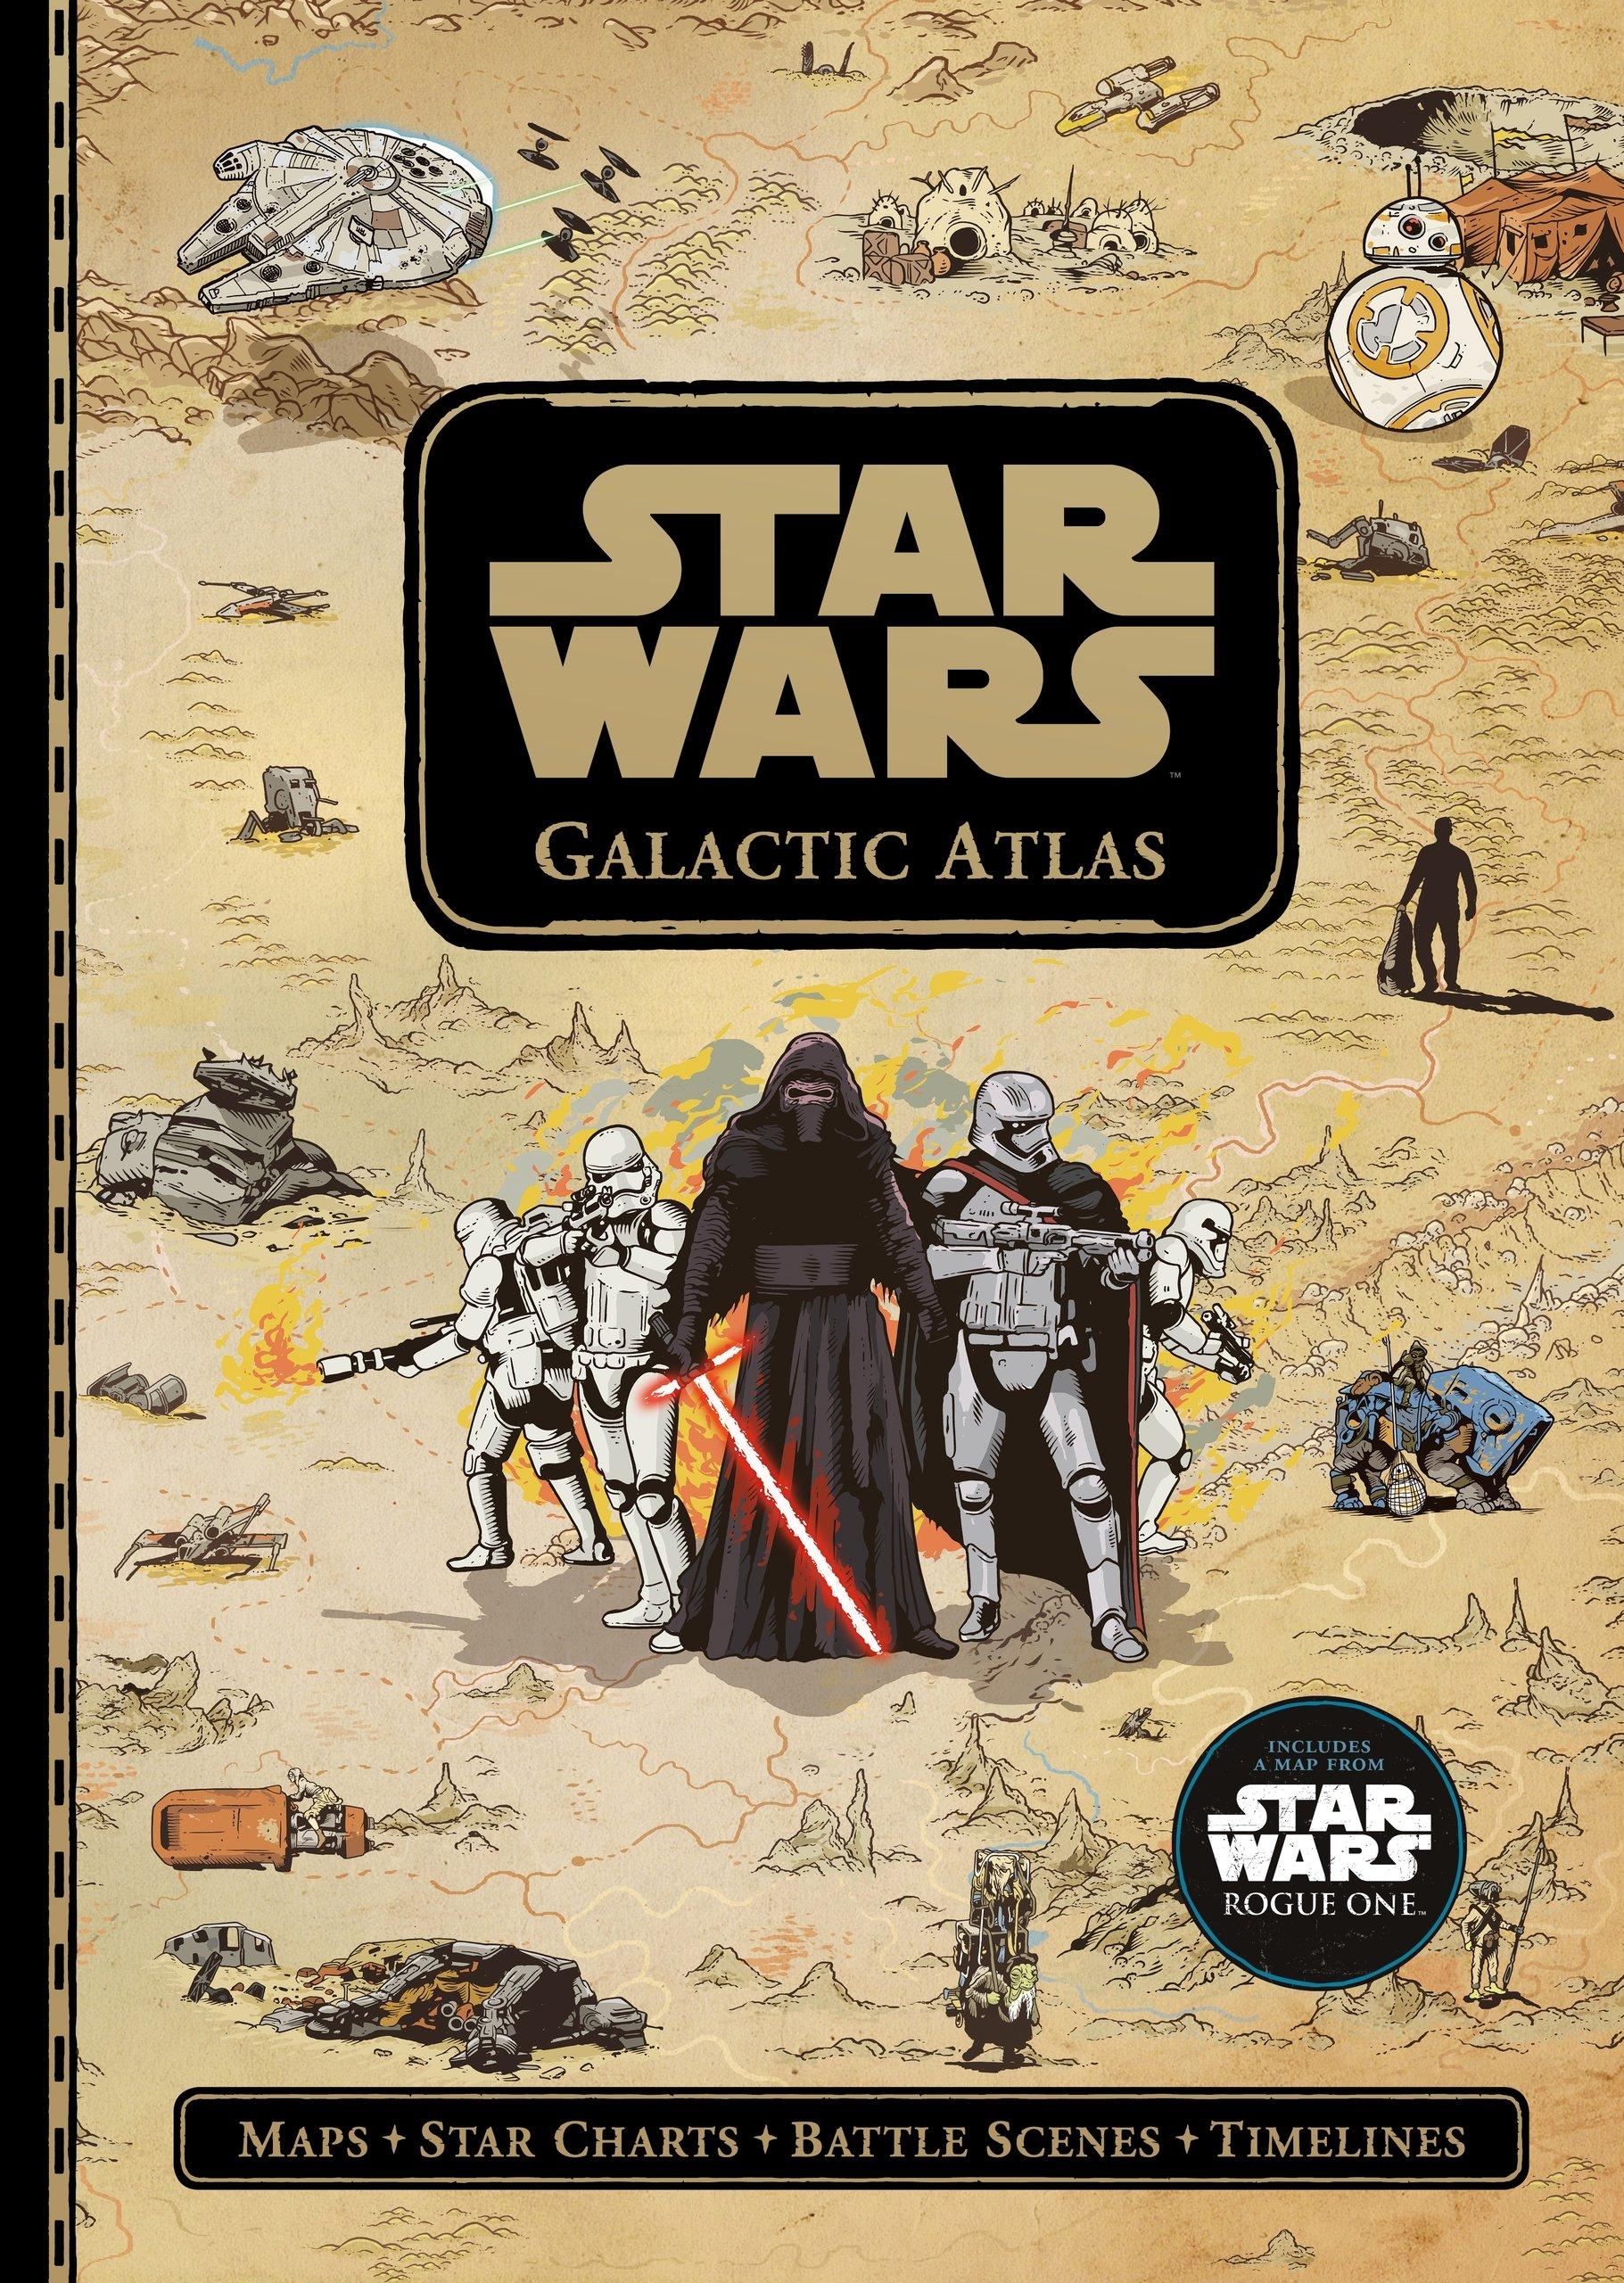 Star Wars: Galactic Atlas